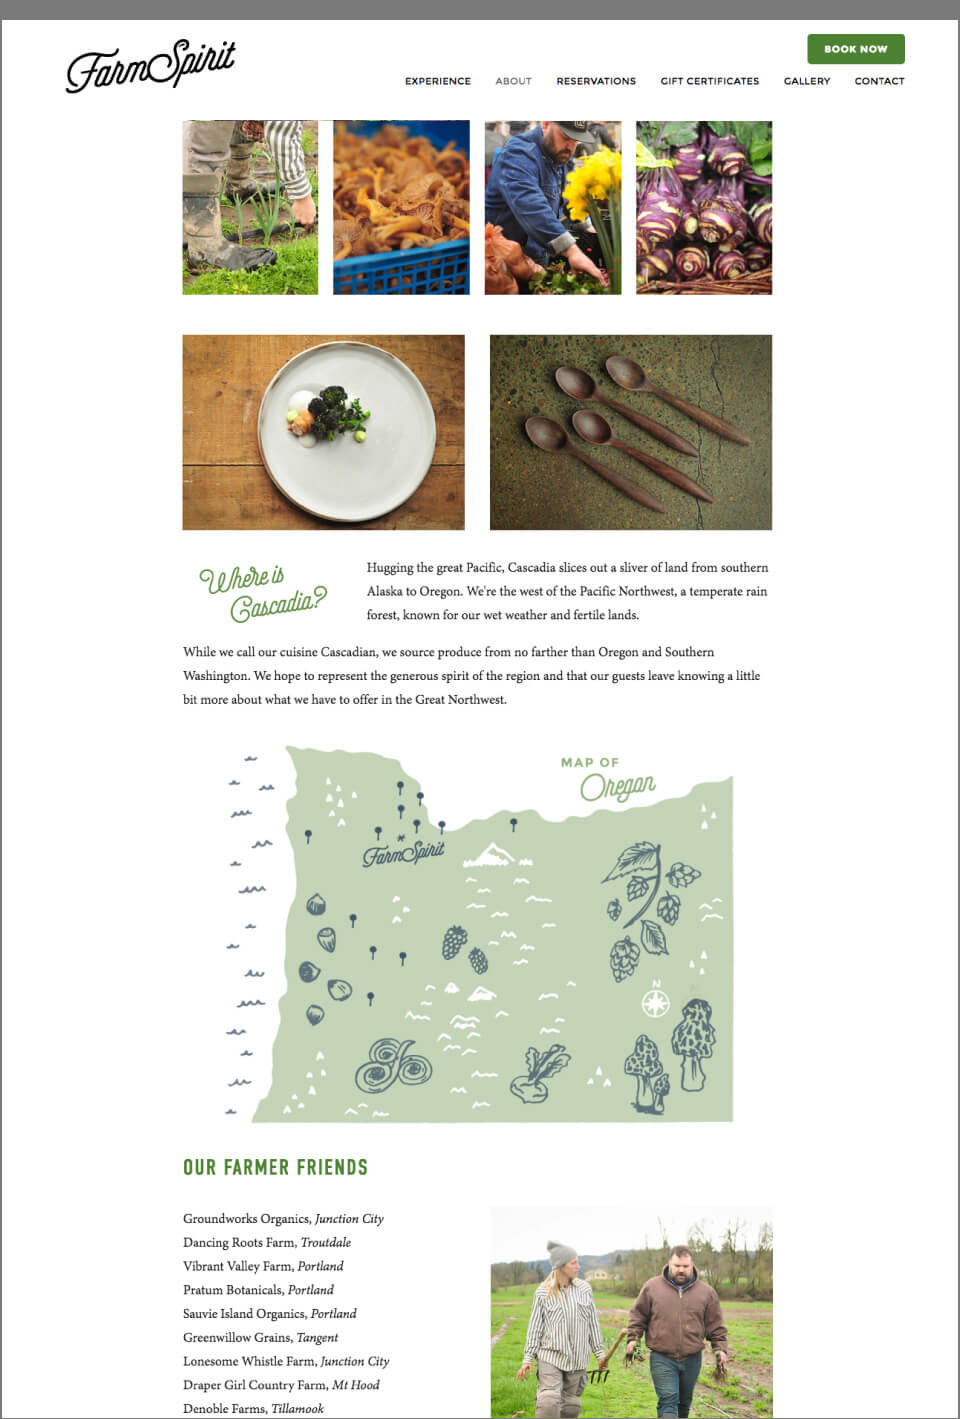 Kat-Marshello-Interactive-Design-Farm-Spirit-About.jpg